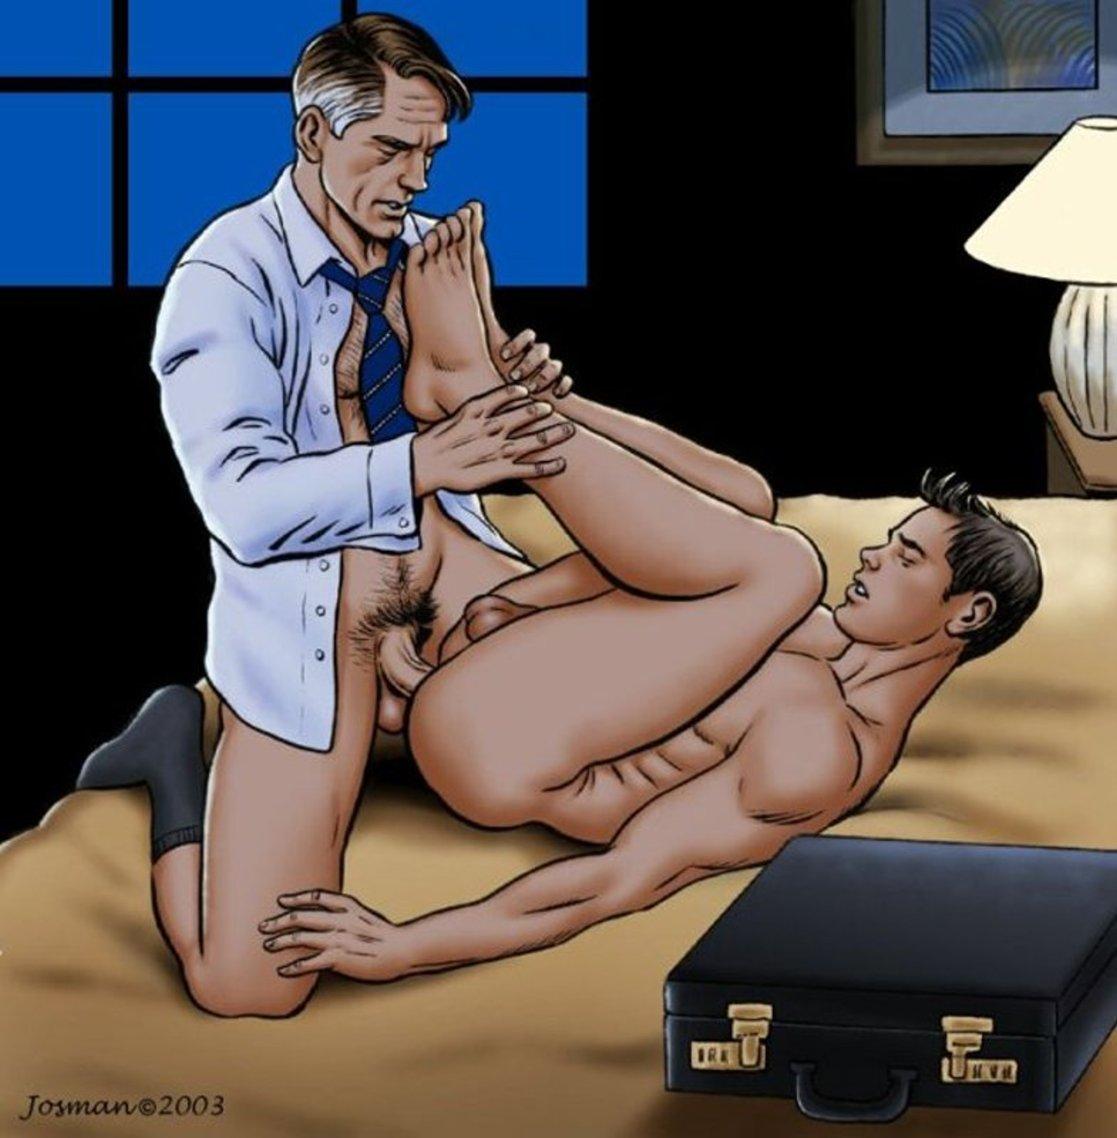 Porn cartoon nude sex photos dawonlod sexy tube